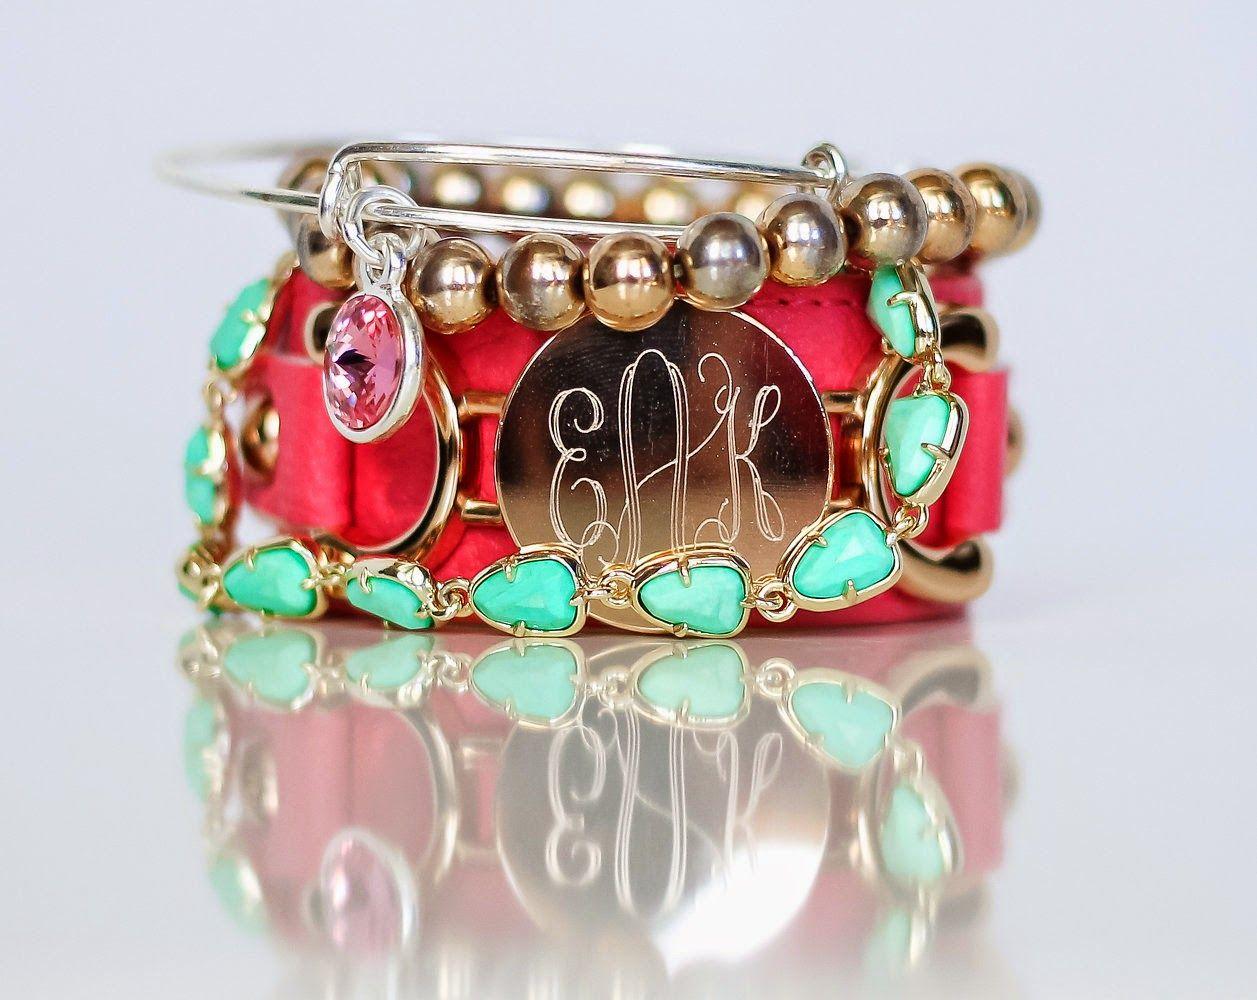 #monogram #bracelets #stack #armparty #armcandy